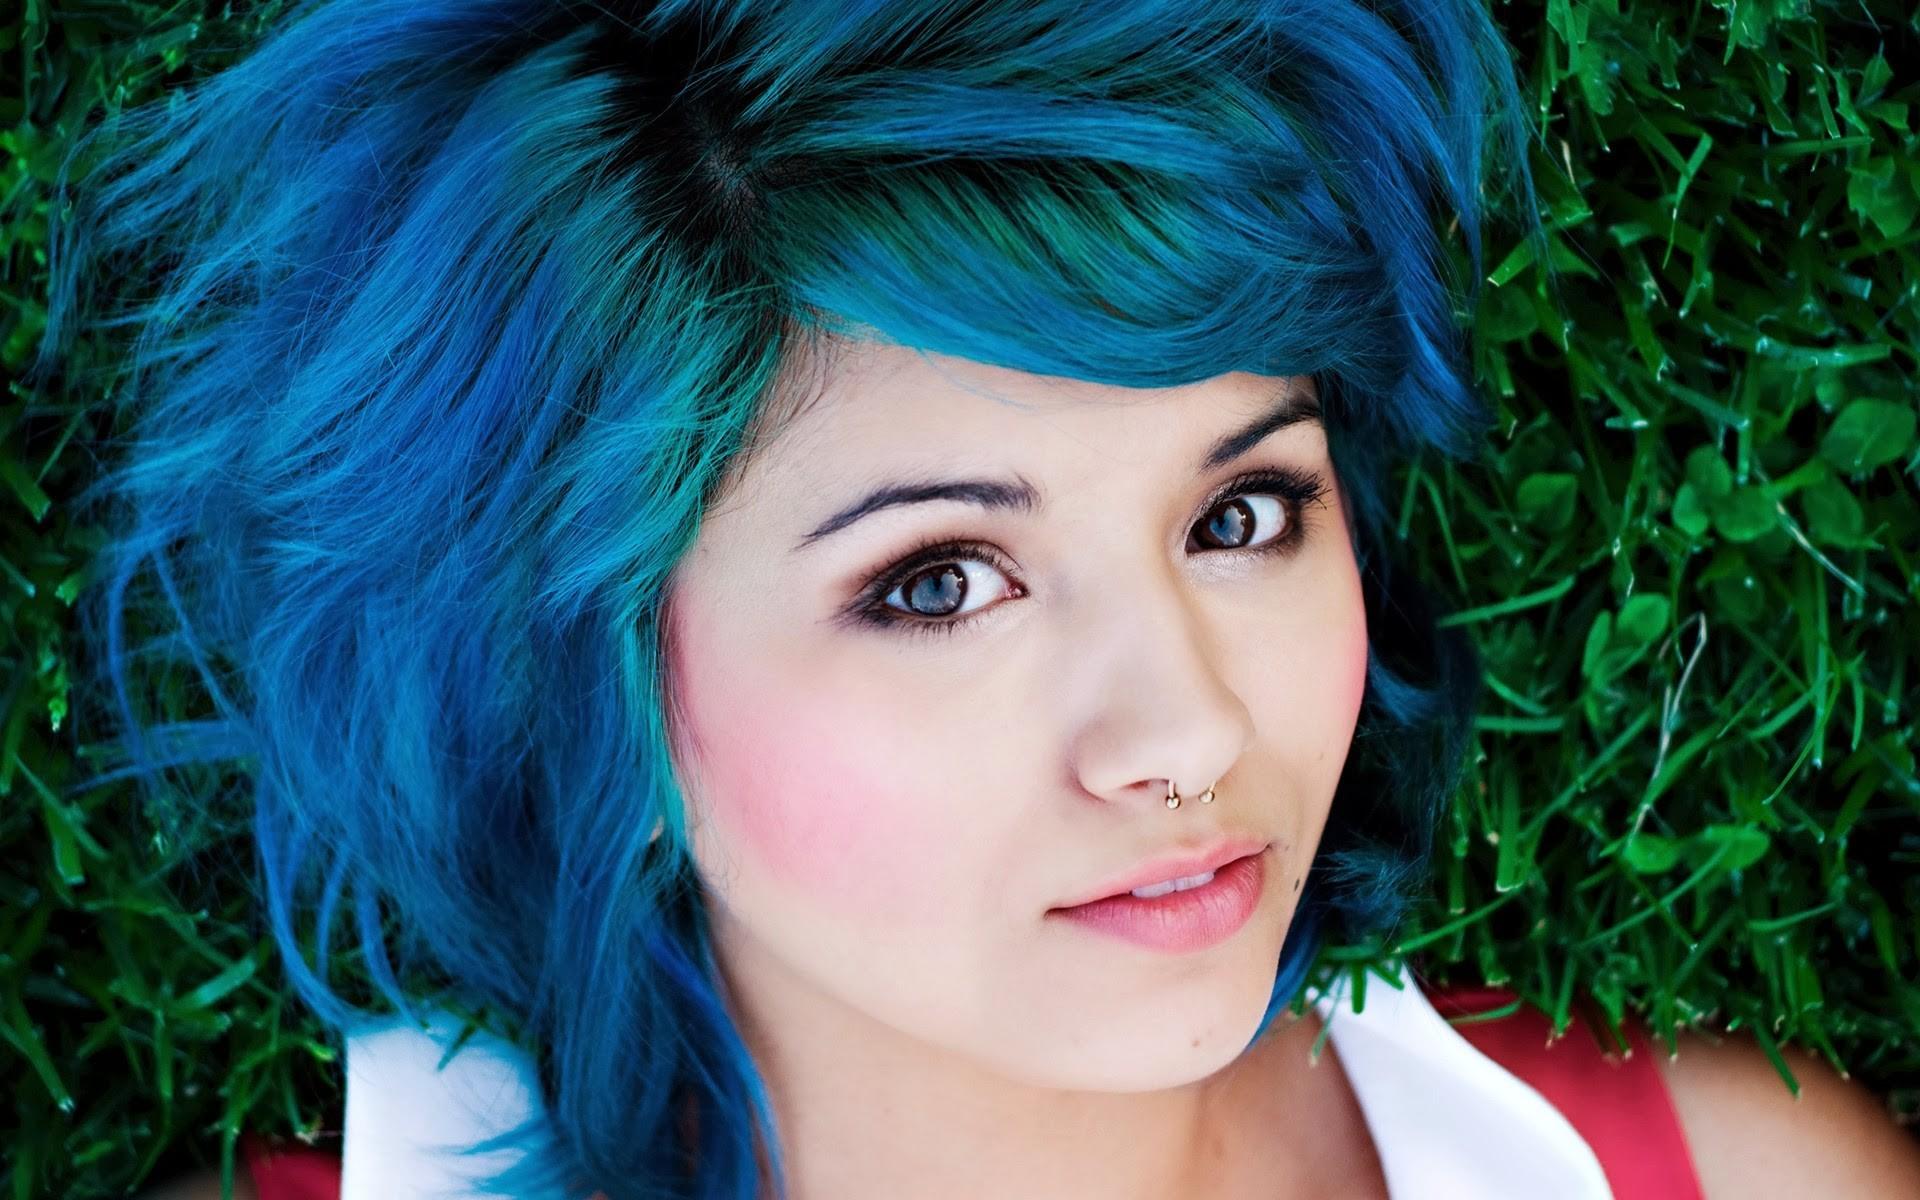 4585927 blue hair face Lia Curtis piercing women nose 1920x1200